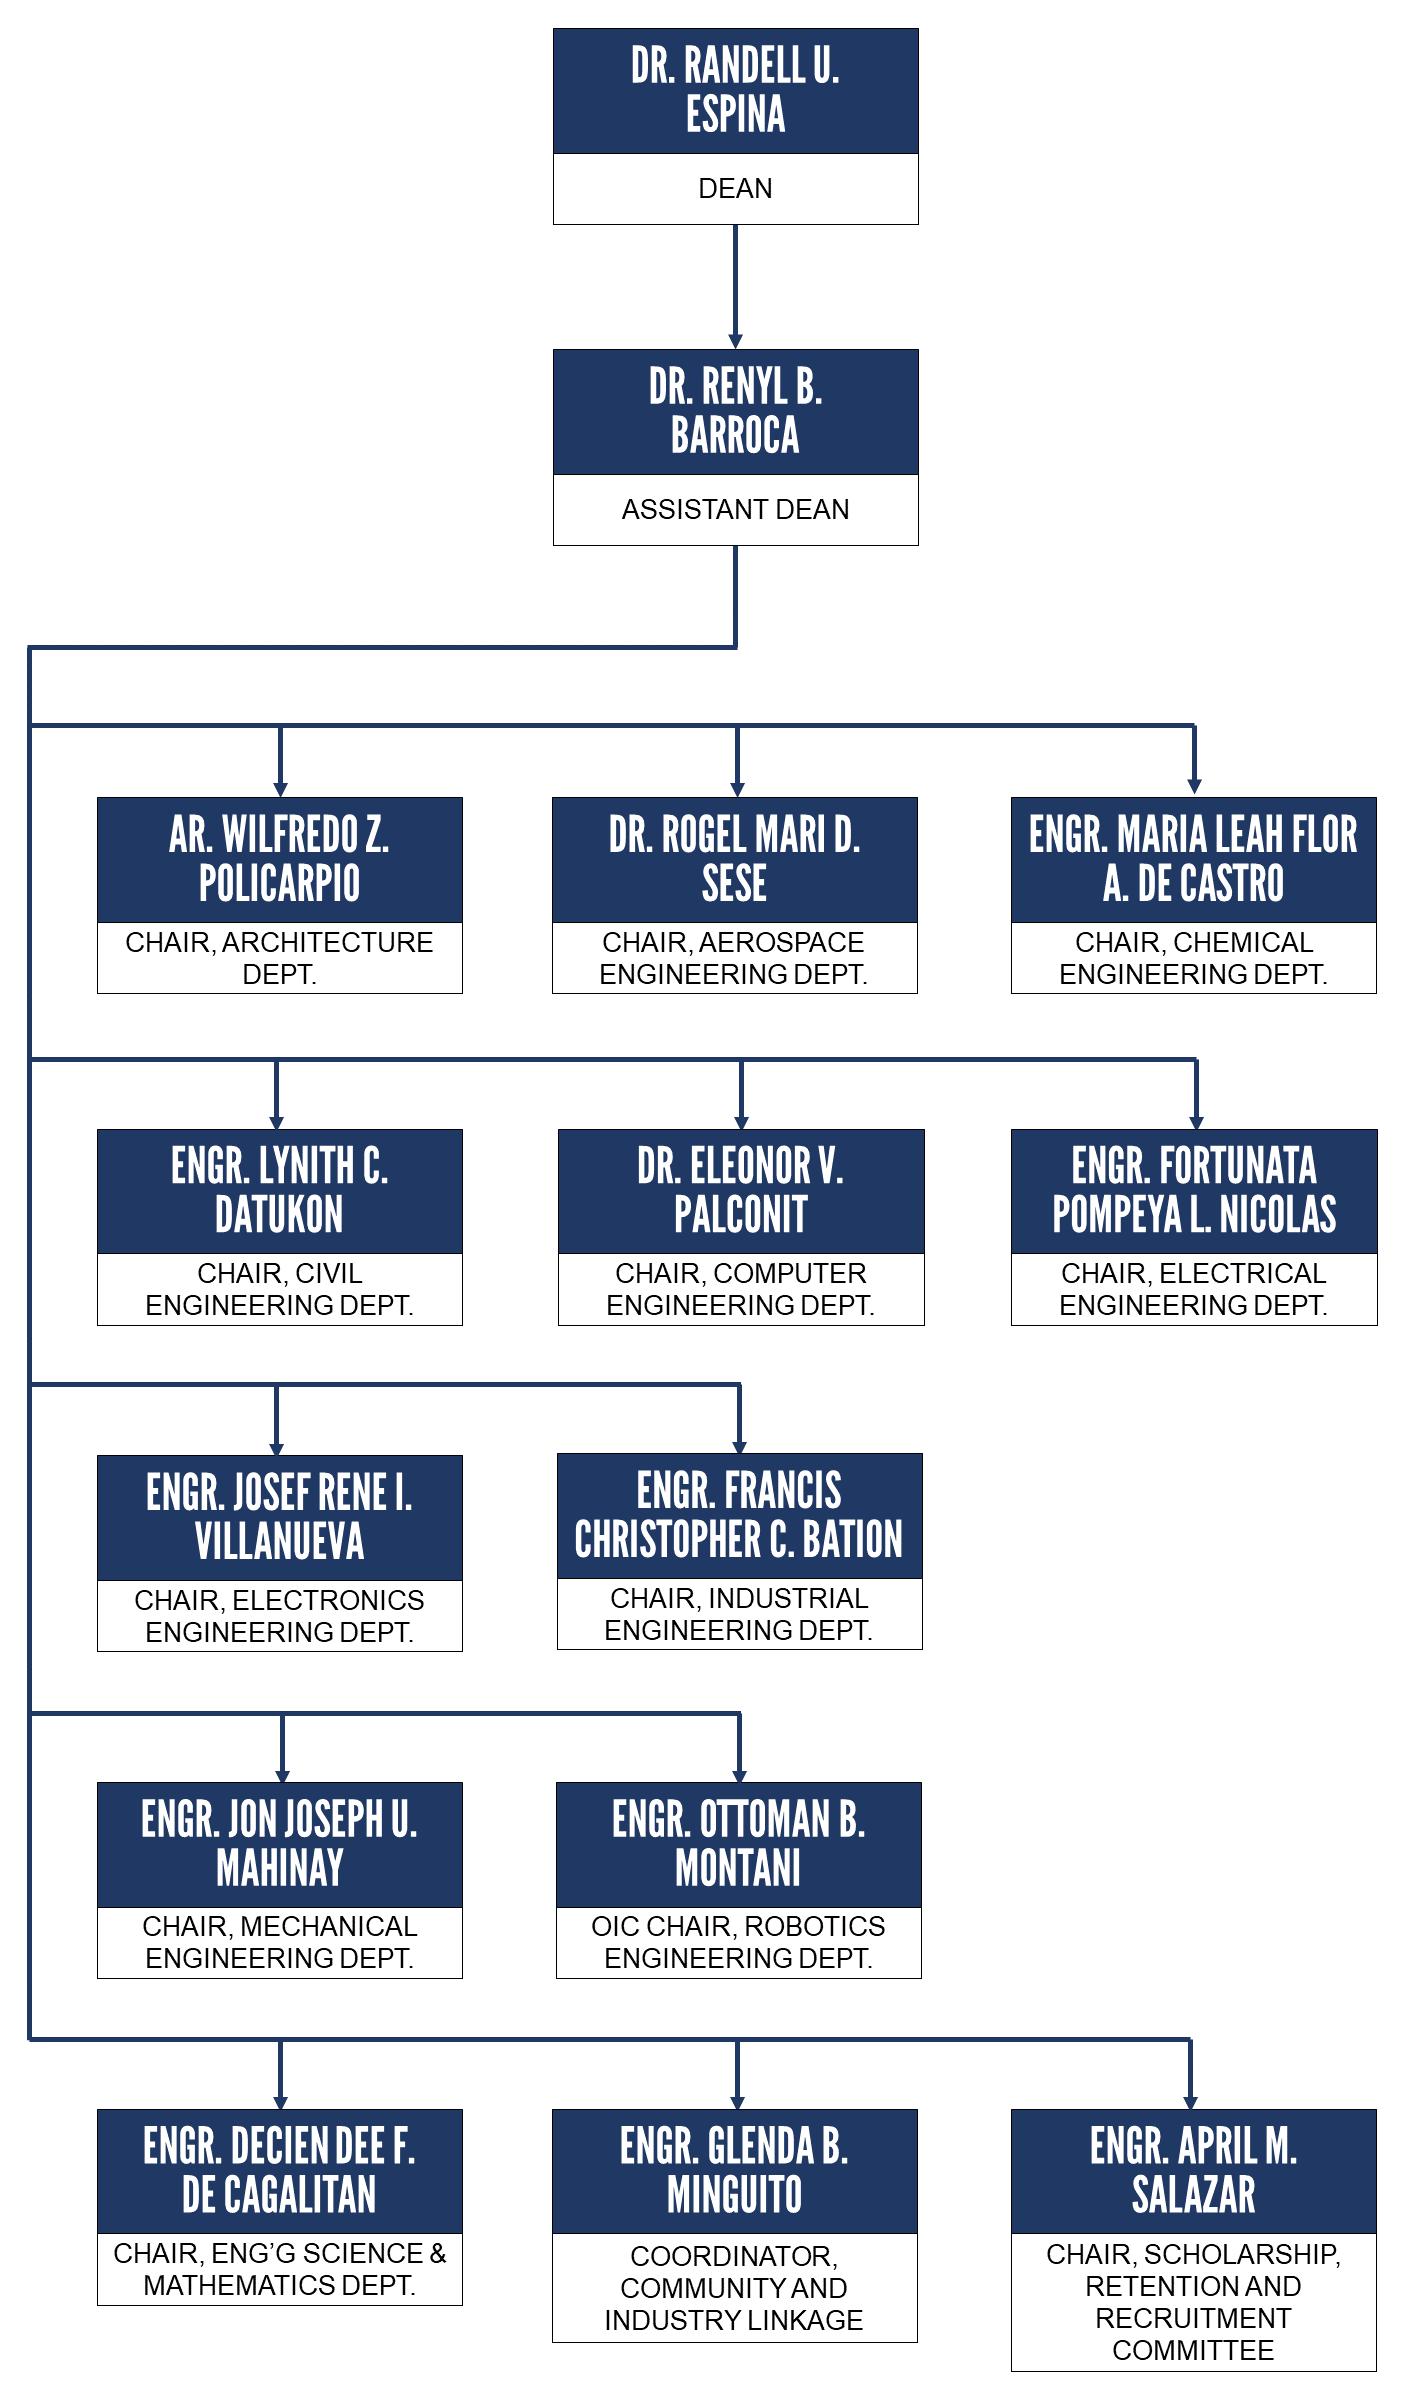 SEA Organizational Chart as of Apr 2021